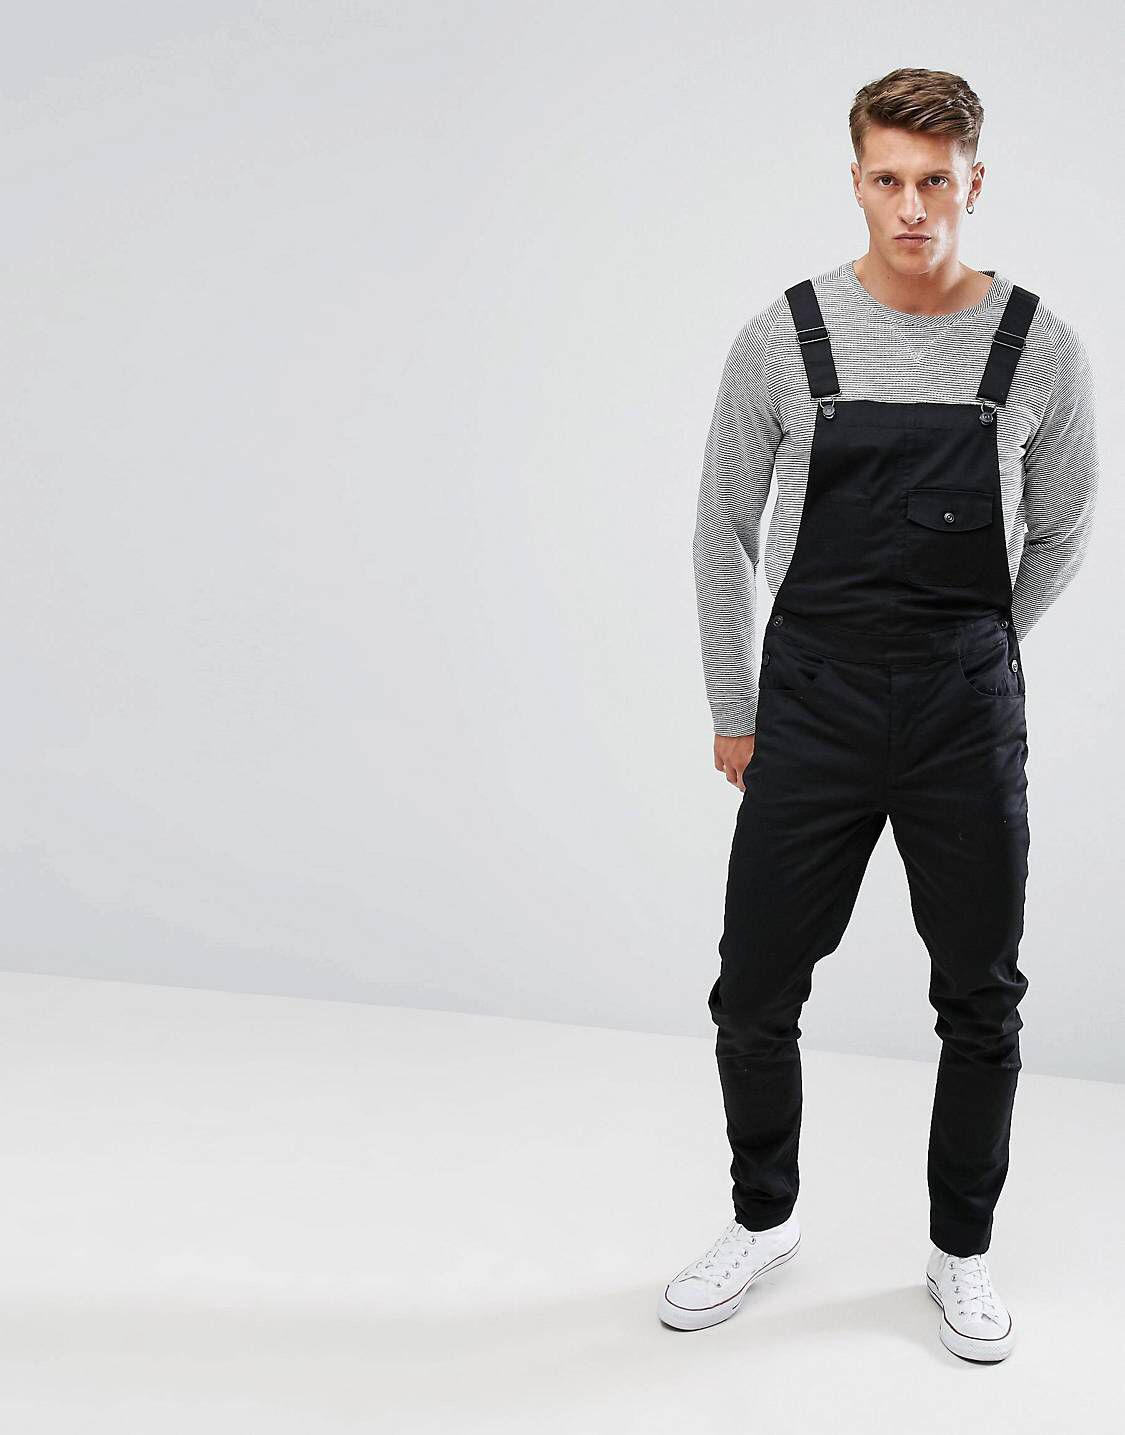 DESIGN skinny overalls in black   Men s style   Overalls, Skinny ... 738b6a65c193